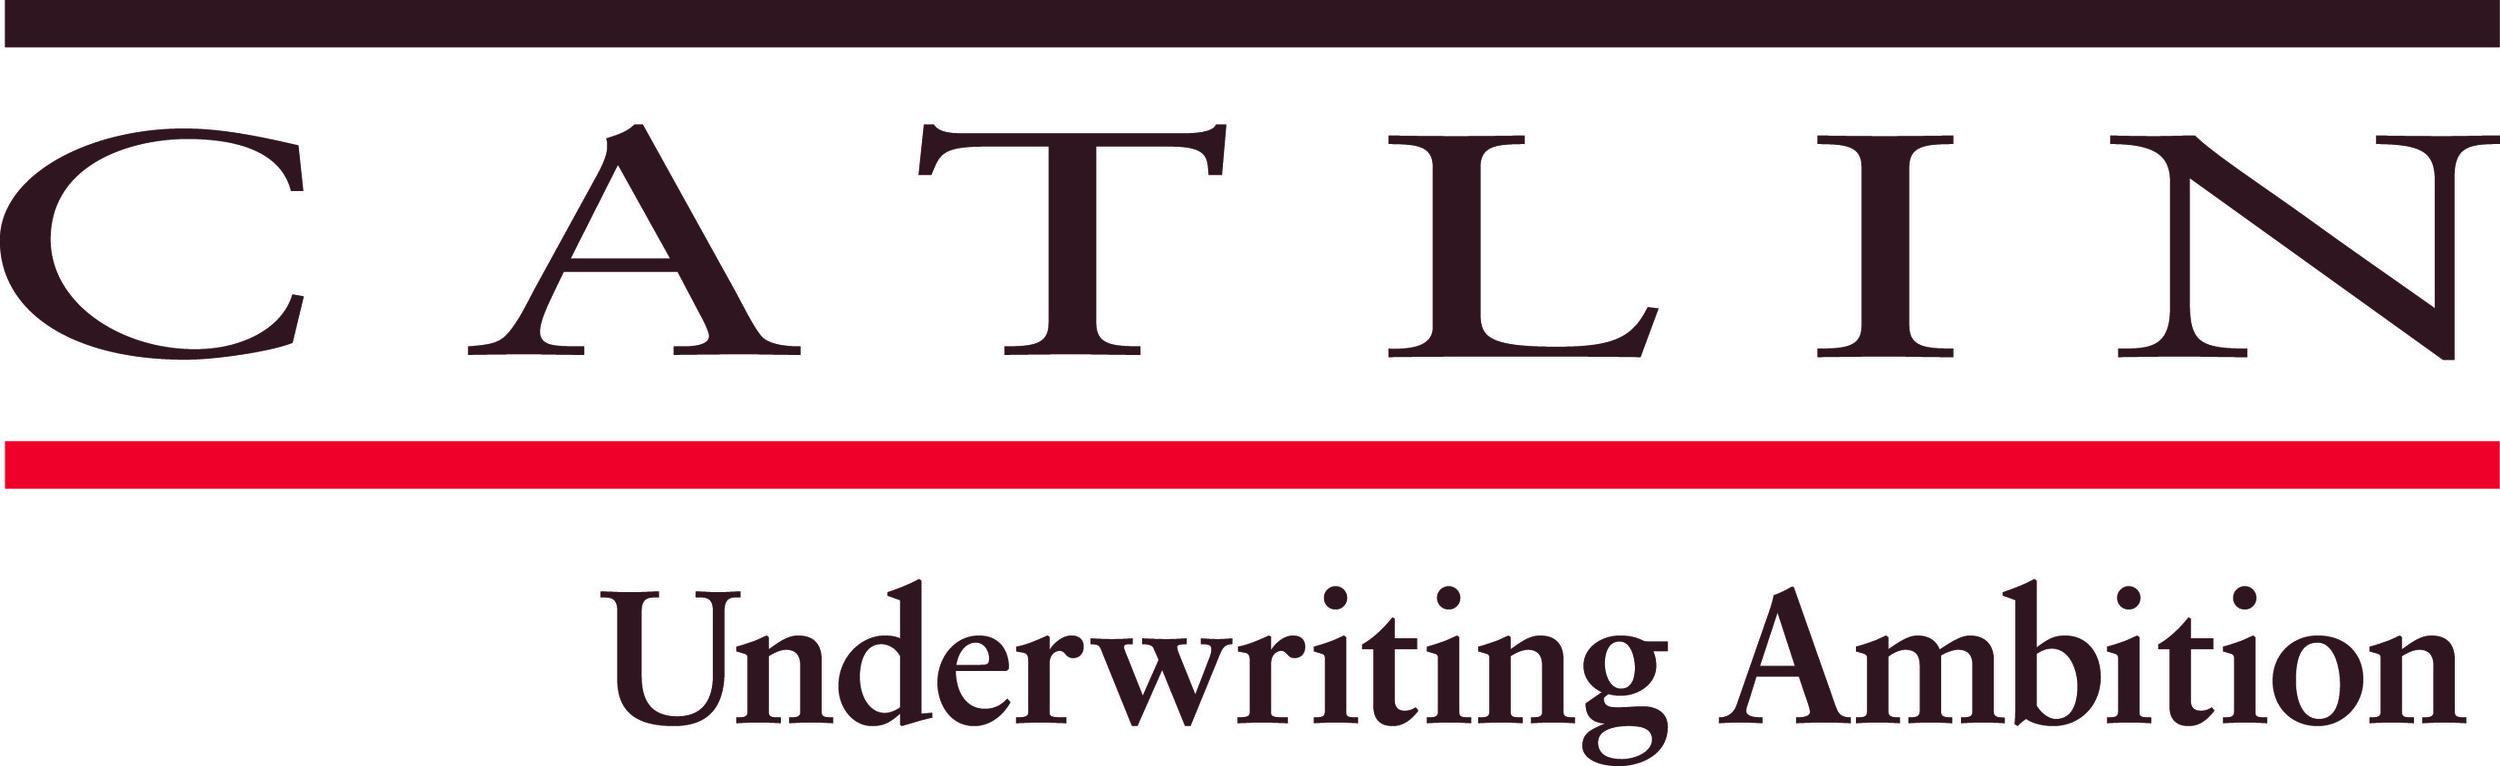 CATLIN_UnderwritingAmbition.jpg